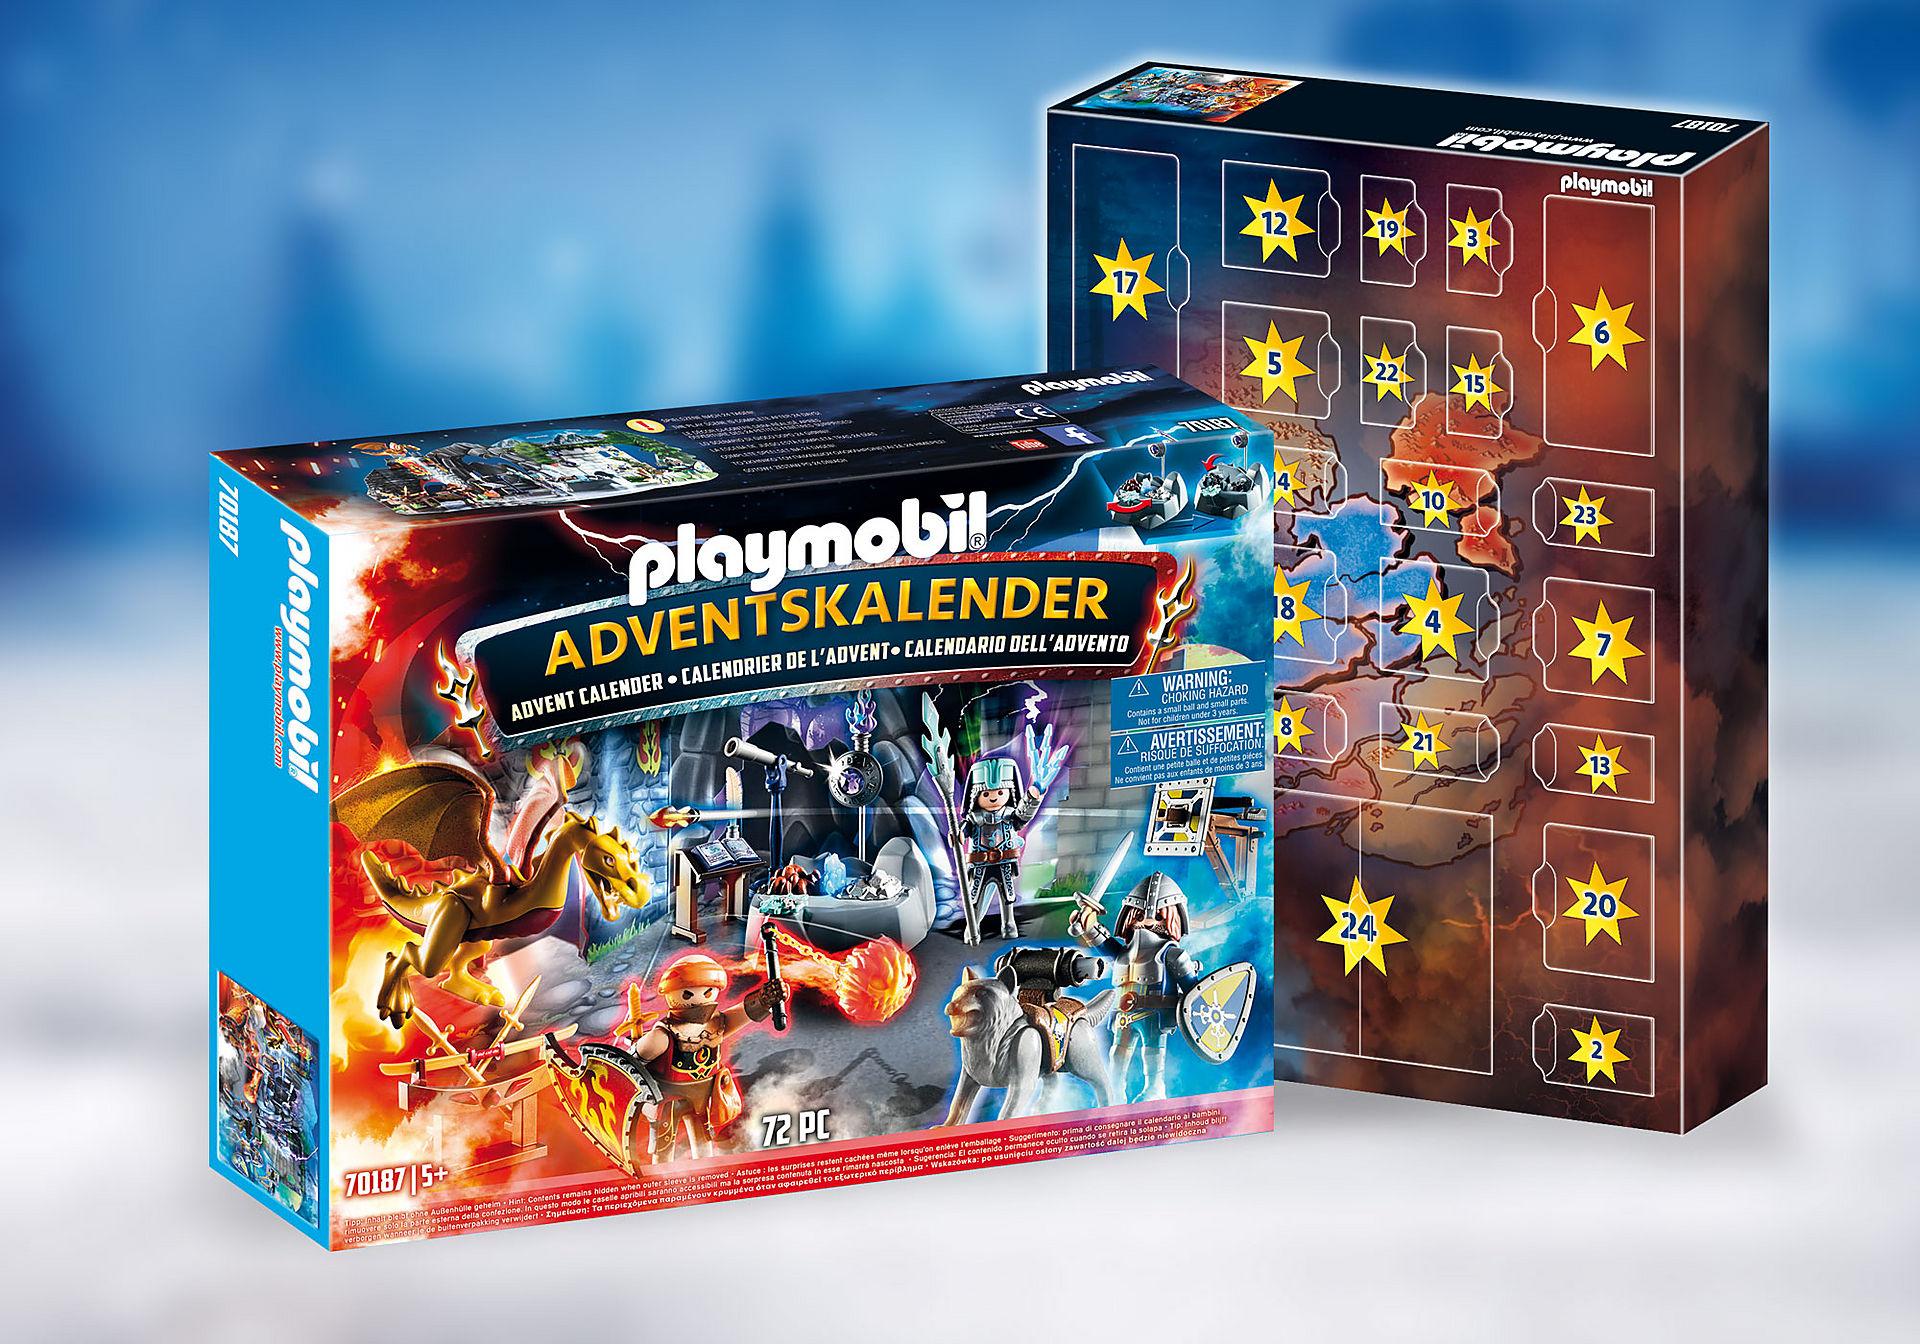 Playmobil Adventskalender 2019 Online Kaufen